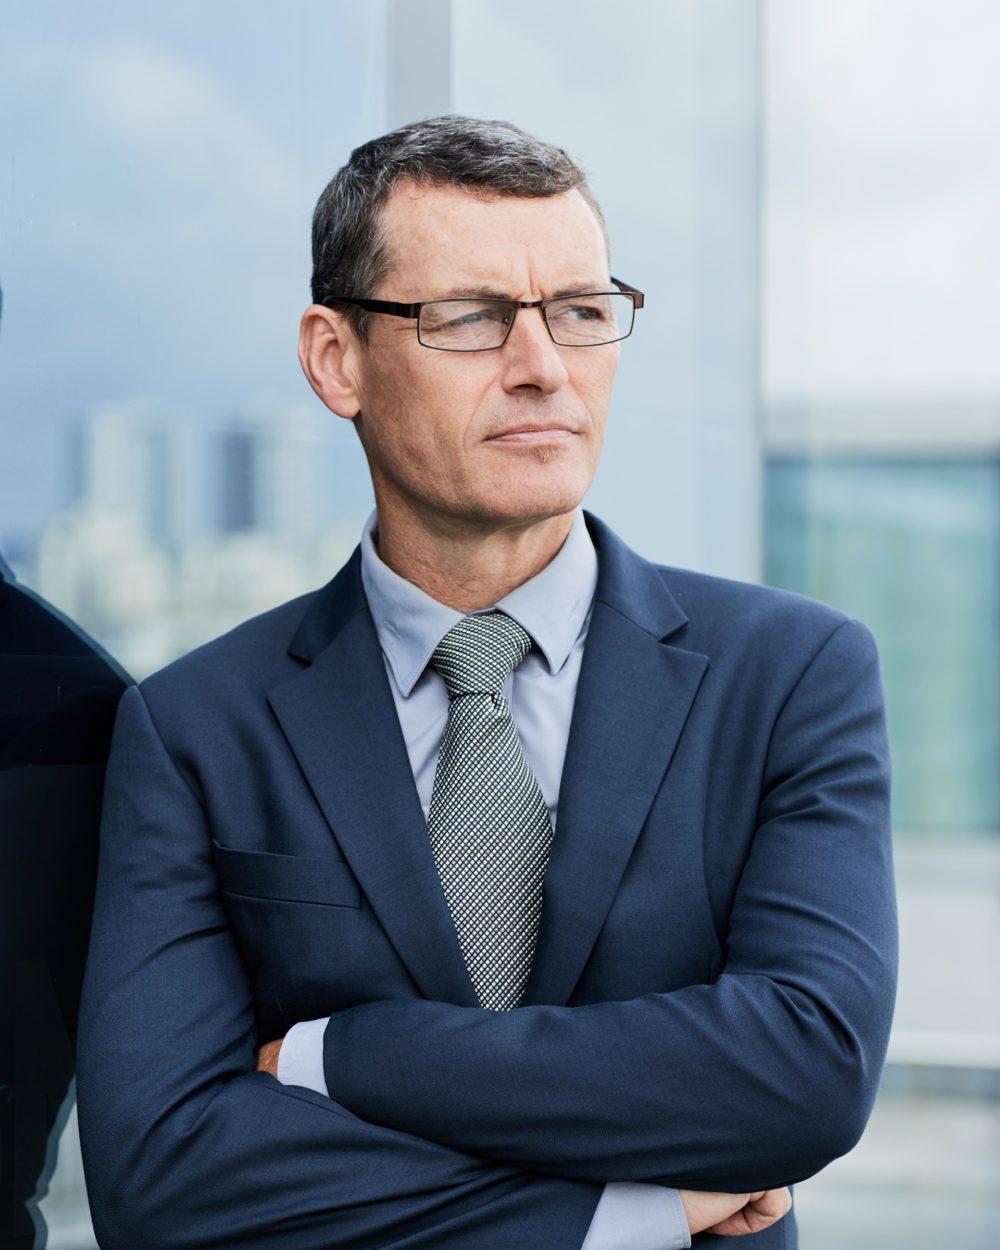 Successful executive hire through recruitment software iExcel Hong Kong